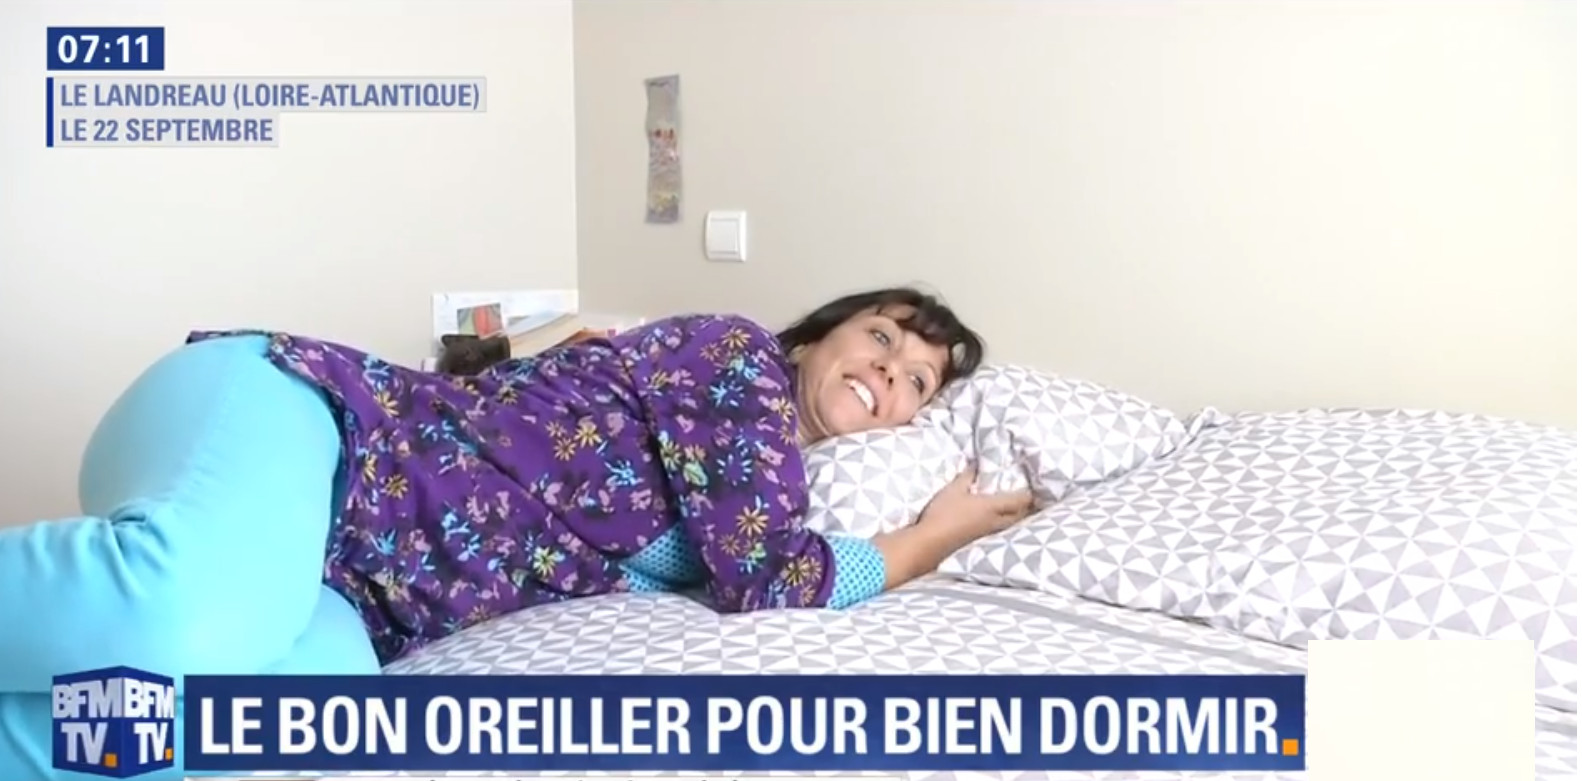 choix d un bon oreiller Oreiller bio naturel en Epeautre, Sarrasin ou Millet : quelle  choix d un bon oreiller